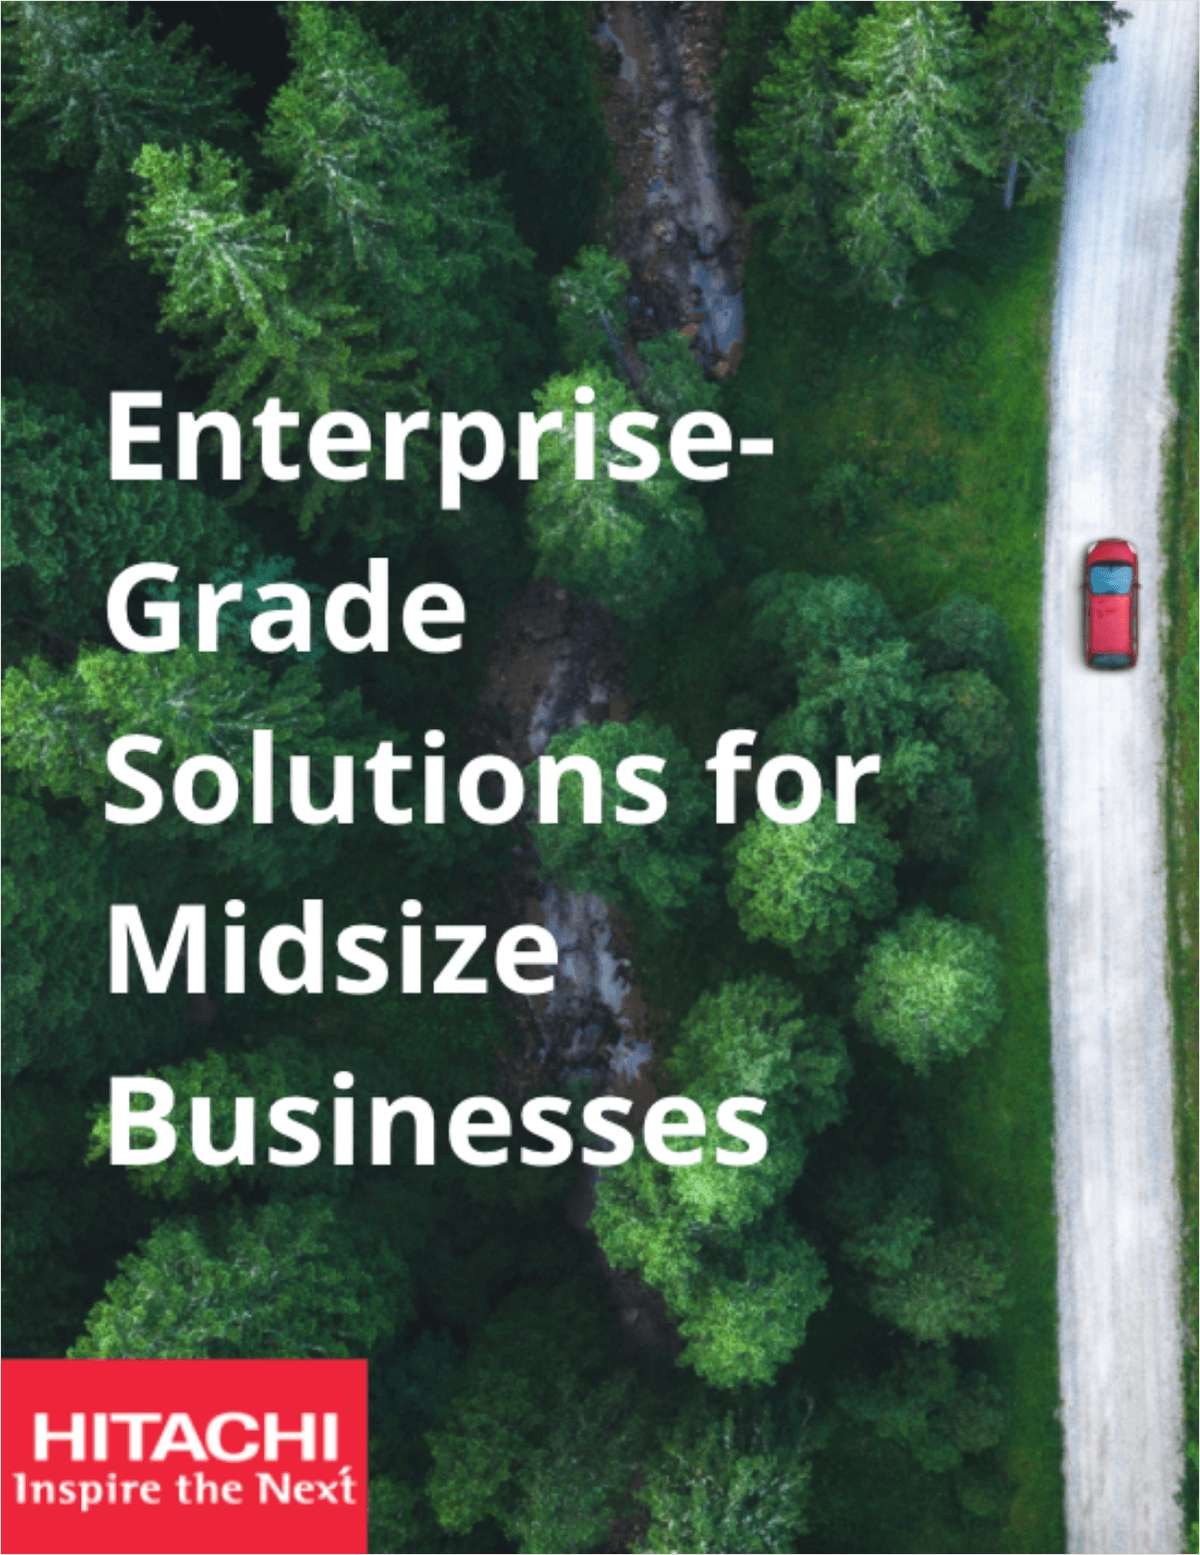 Enterprise-Grade Solutions for Midsize Businesses